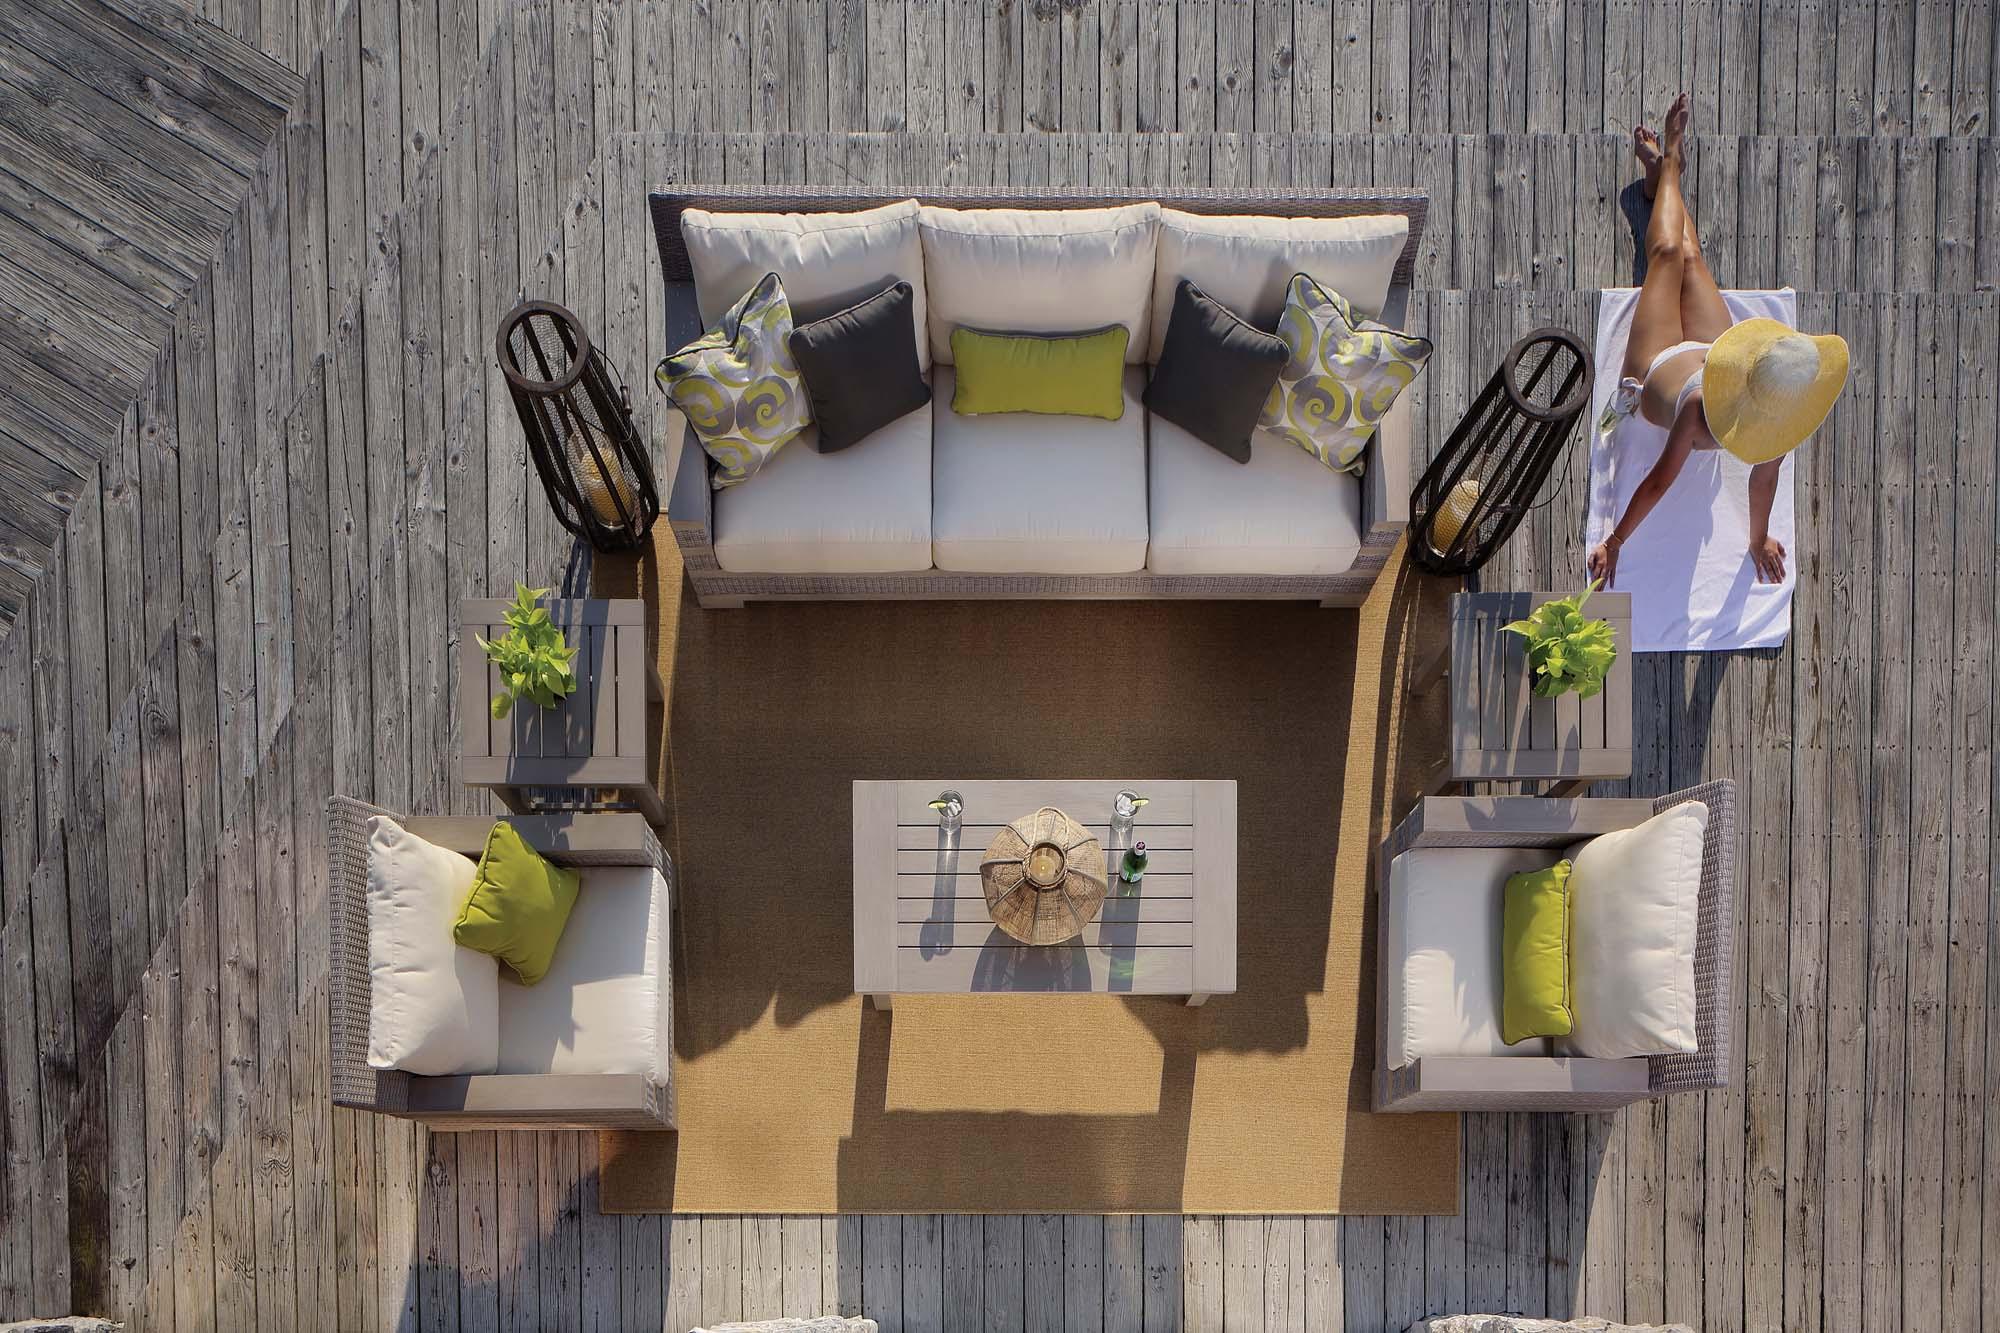 Outdoor Furniture Manufacturer Summer Classics Wins ICFA Design - Summer classics outdoor furniture